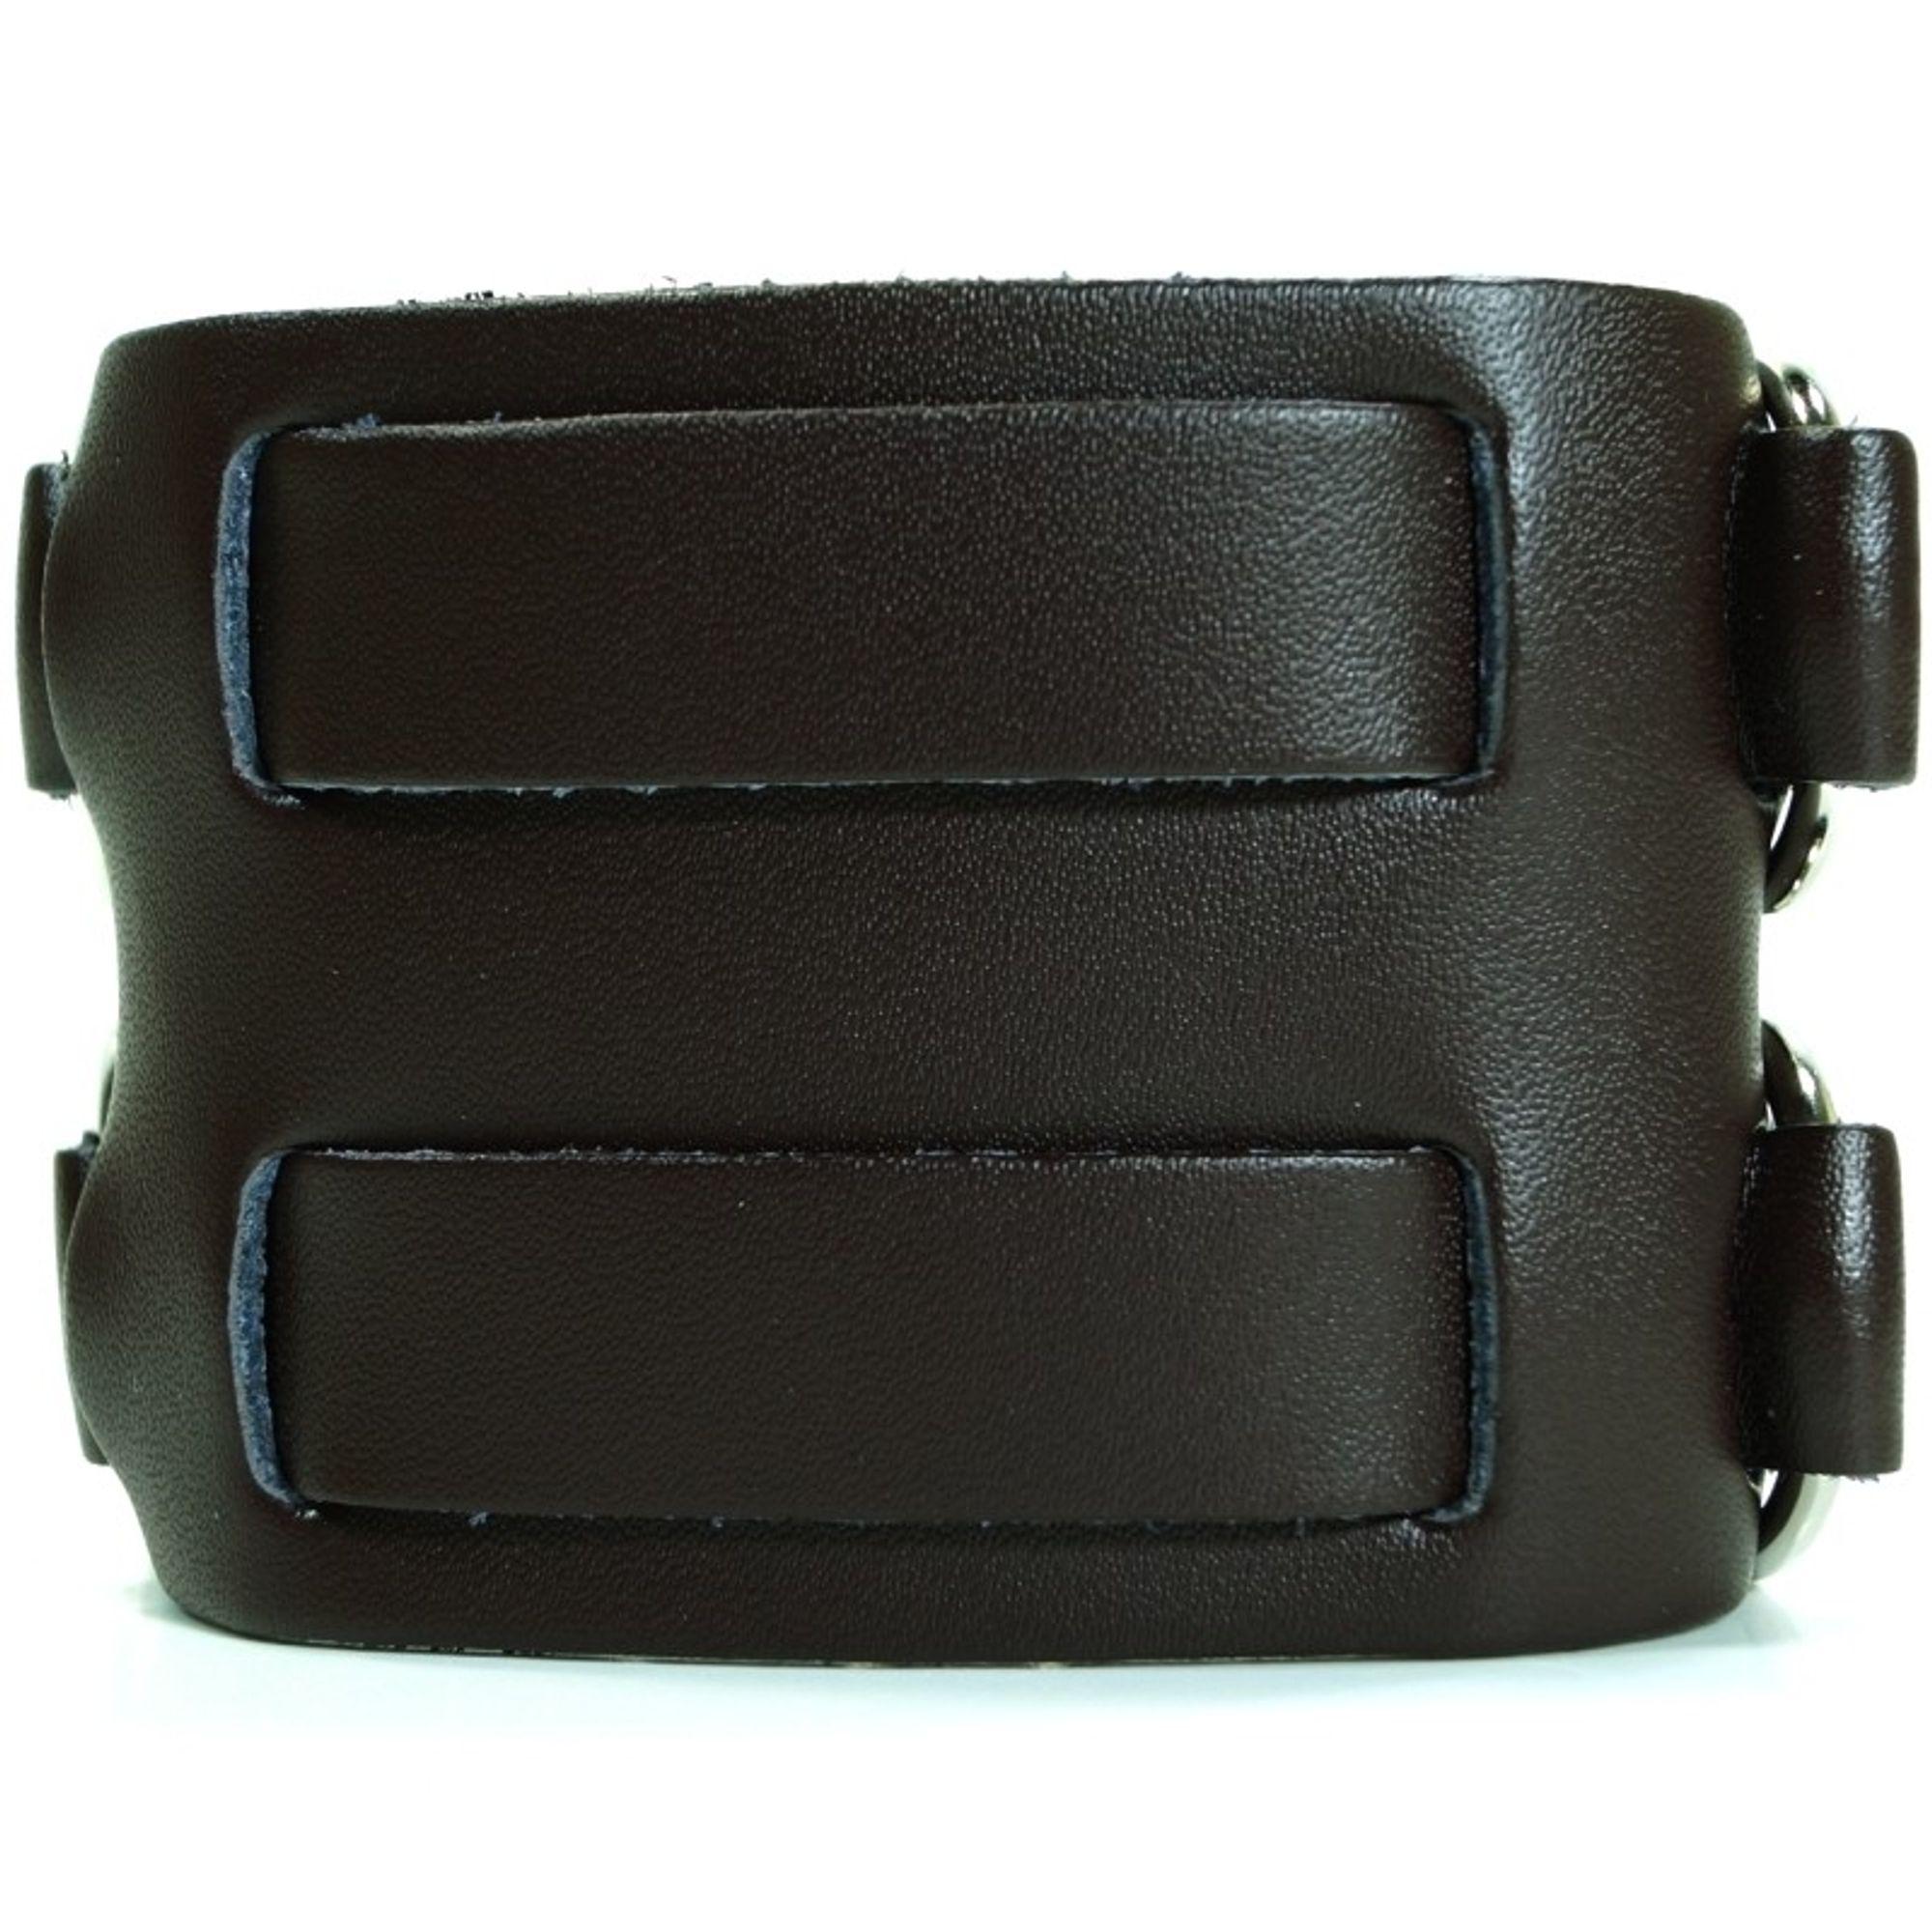 CJBB1913-2 Herren Armband Leder braun 22,5 cm